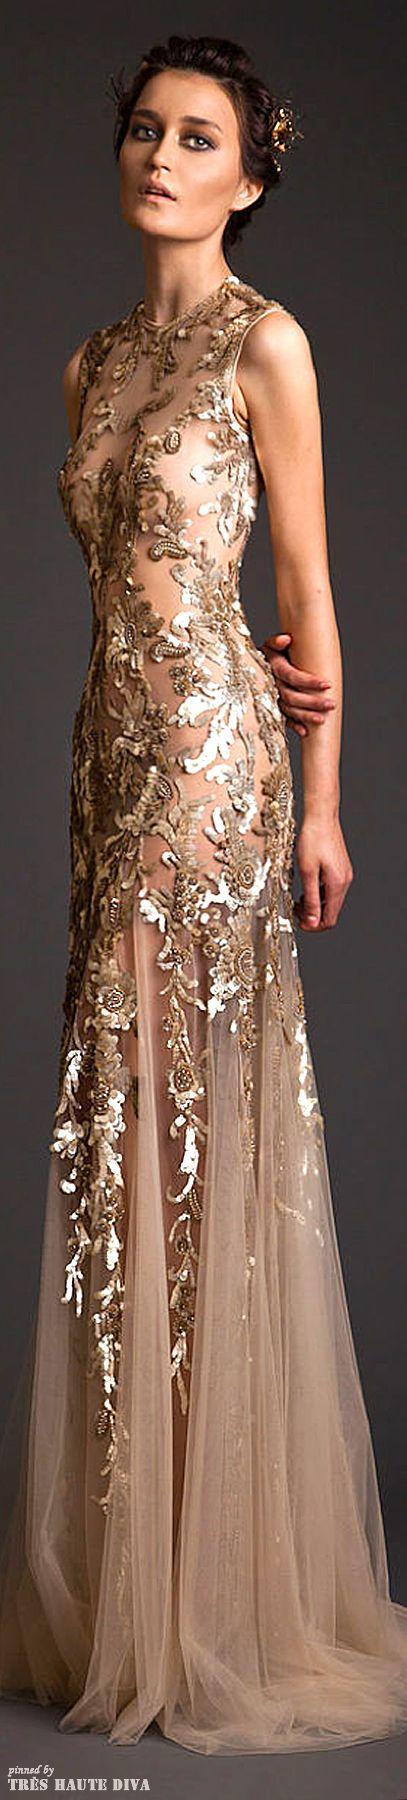 #Krikor Jabotian Couture S/S 2014                                                                                                                                                                                 Mehr